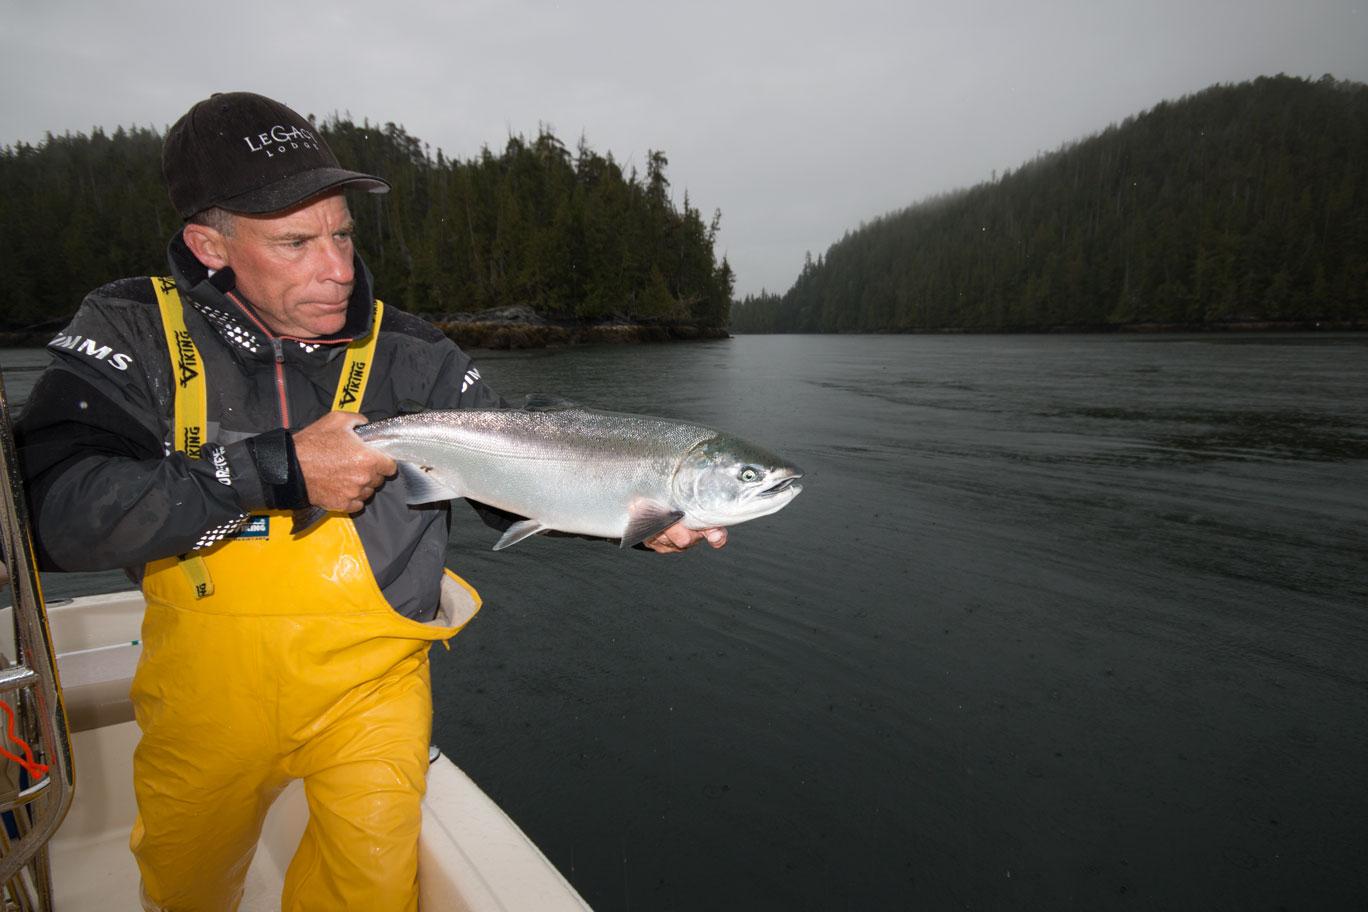 Legacy lodge 12 american angleramerican angler for American legacy fishing